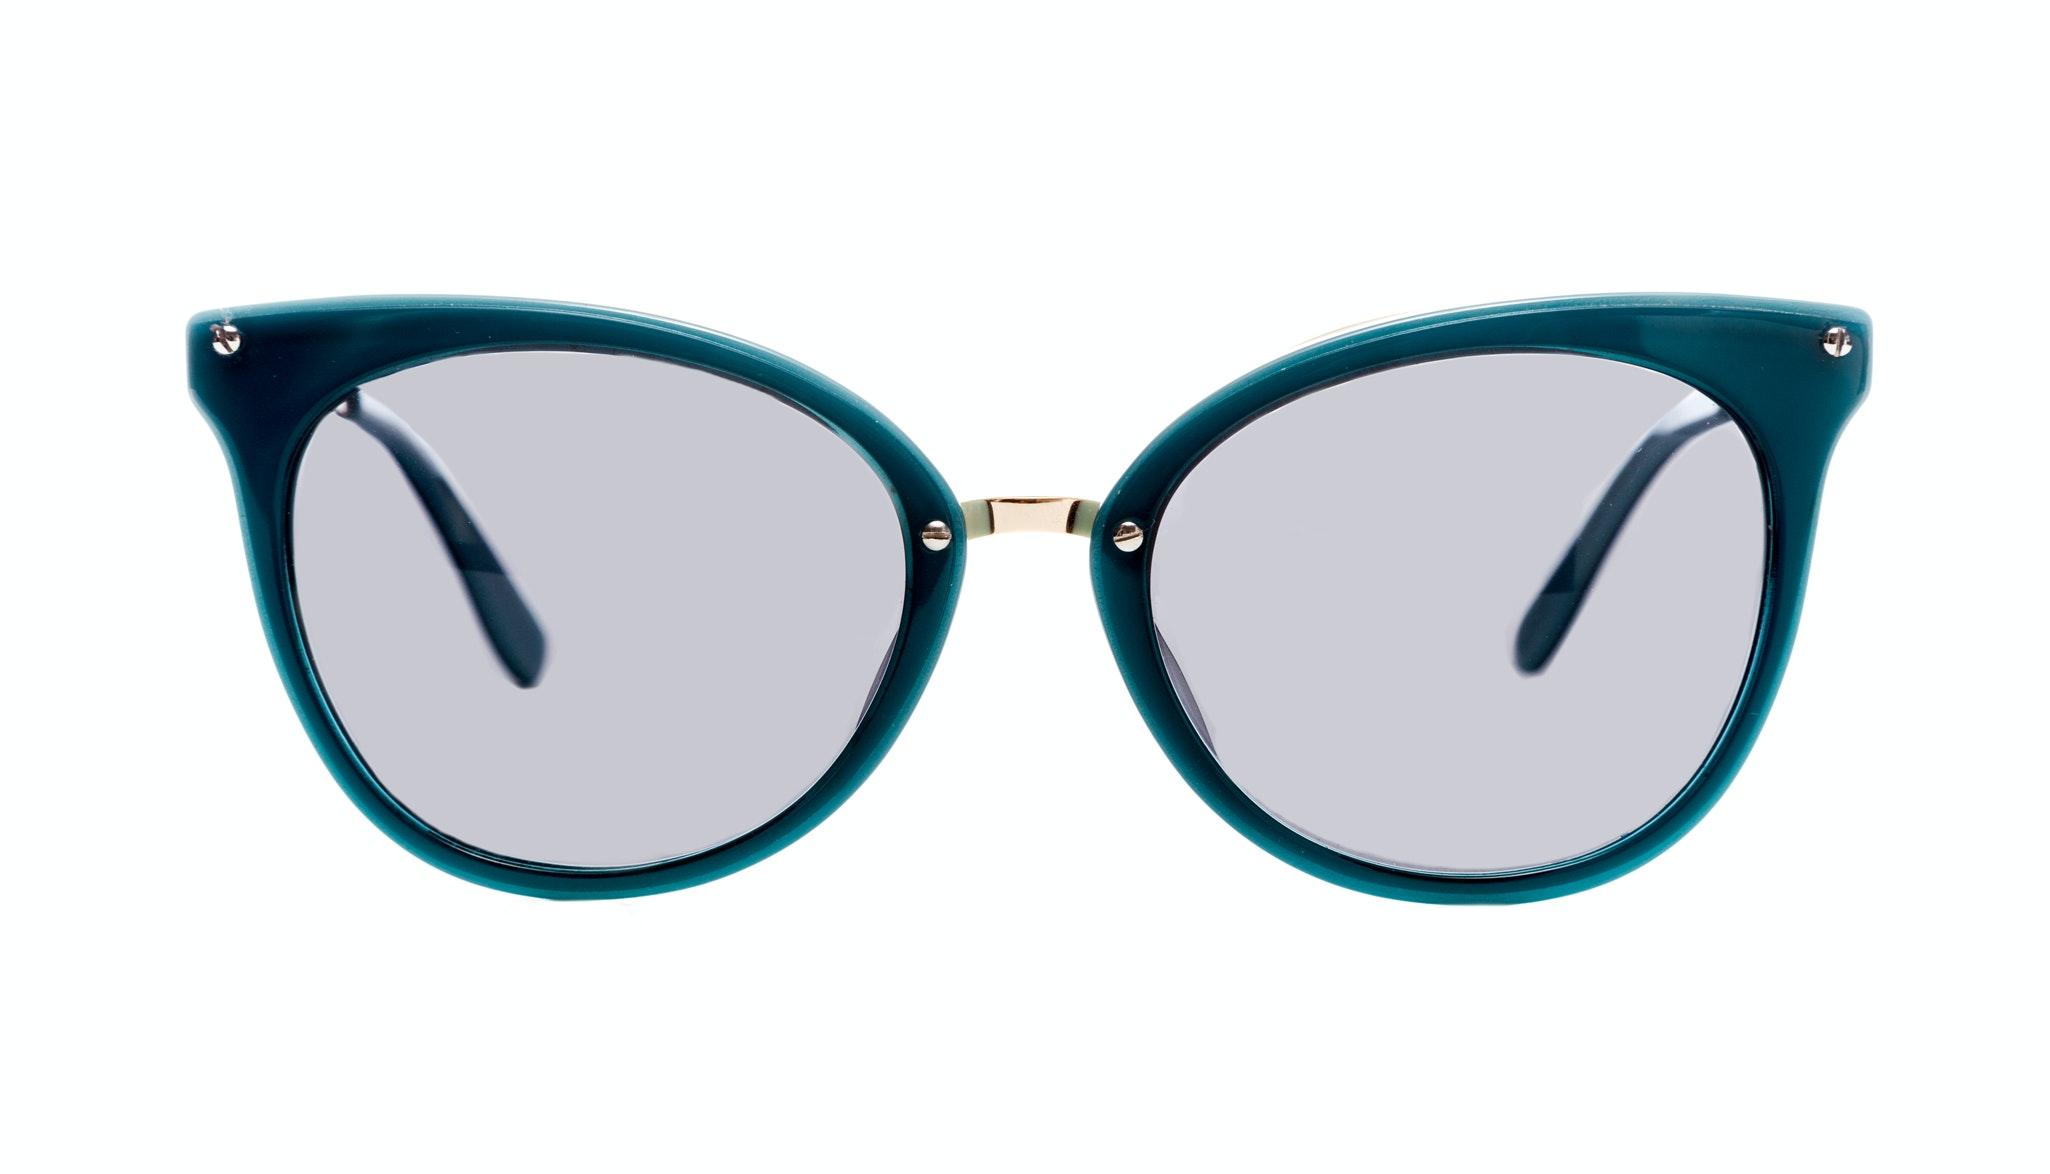 Affordable Fashion Glasses Cat Eye Sunglasses Women BFF Aquamarine Front